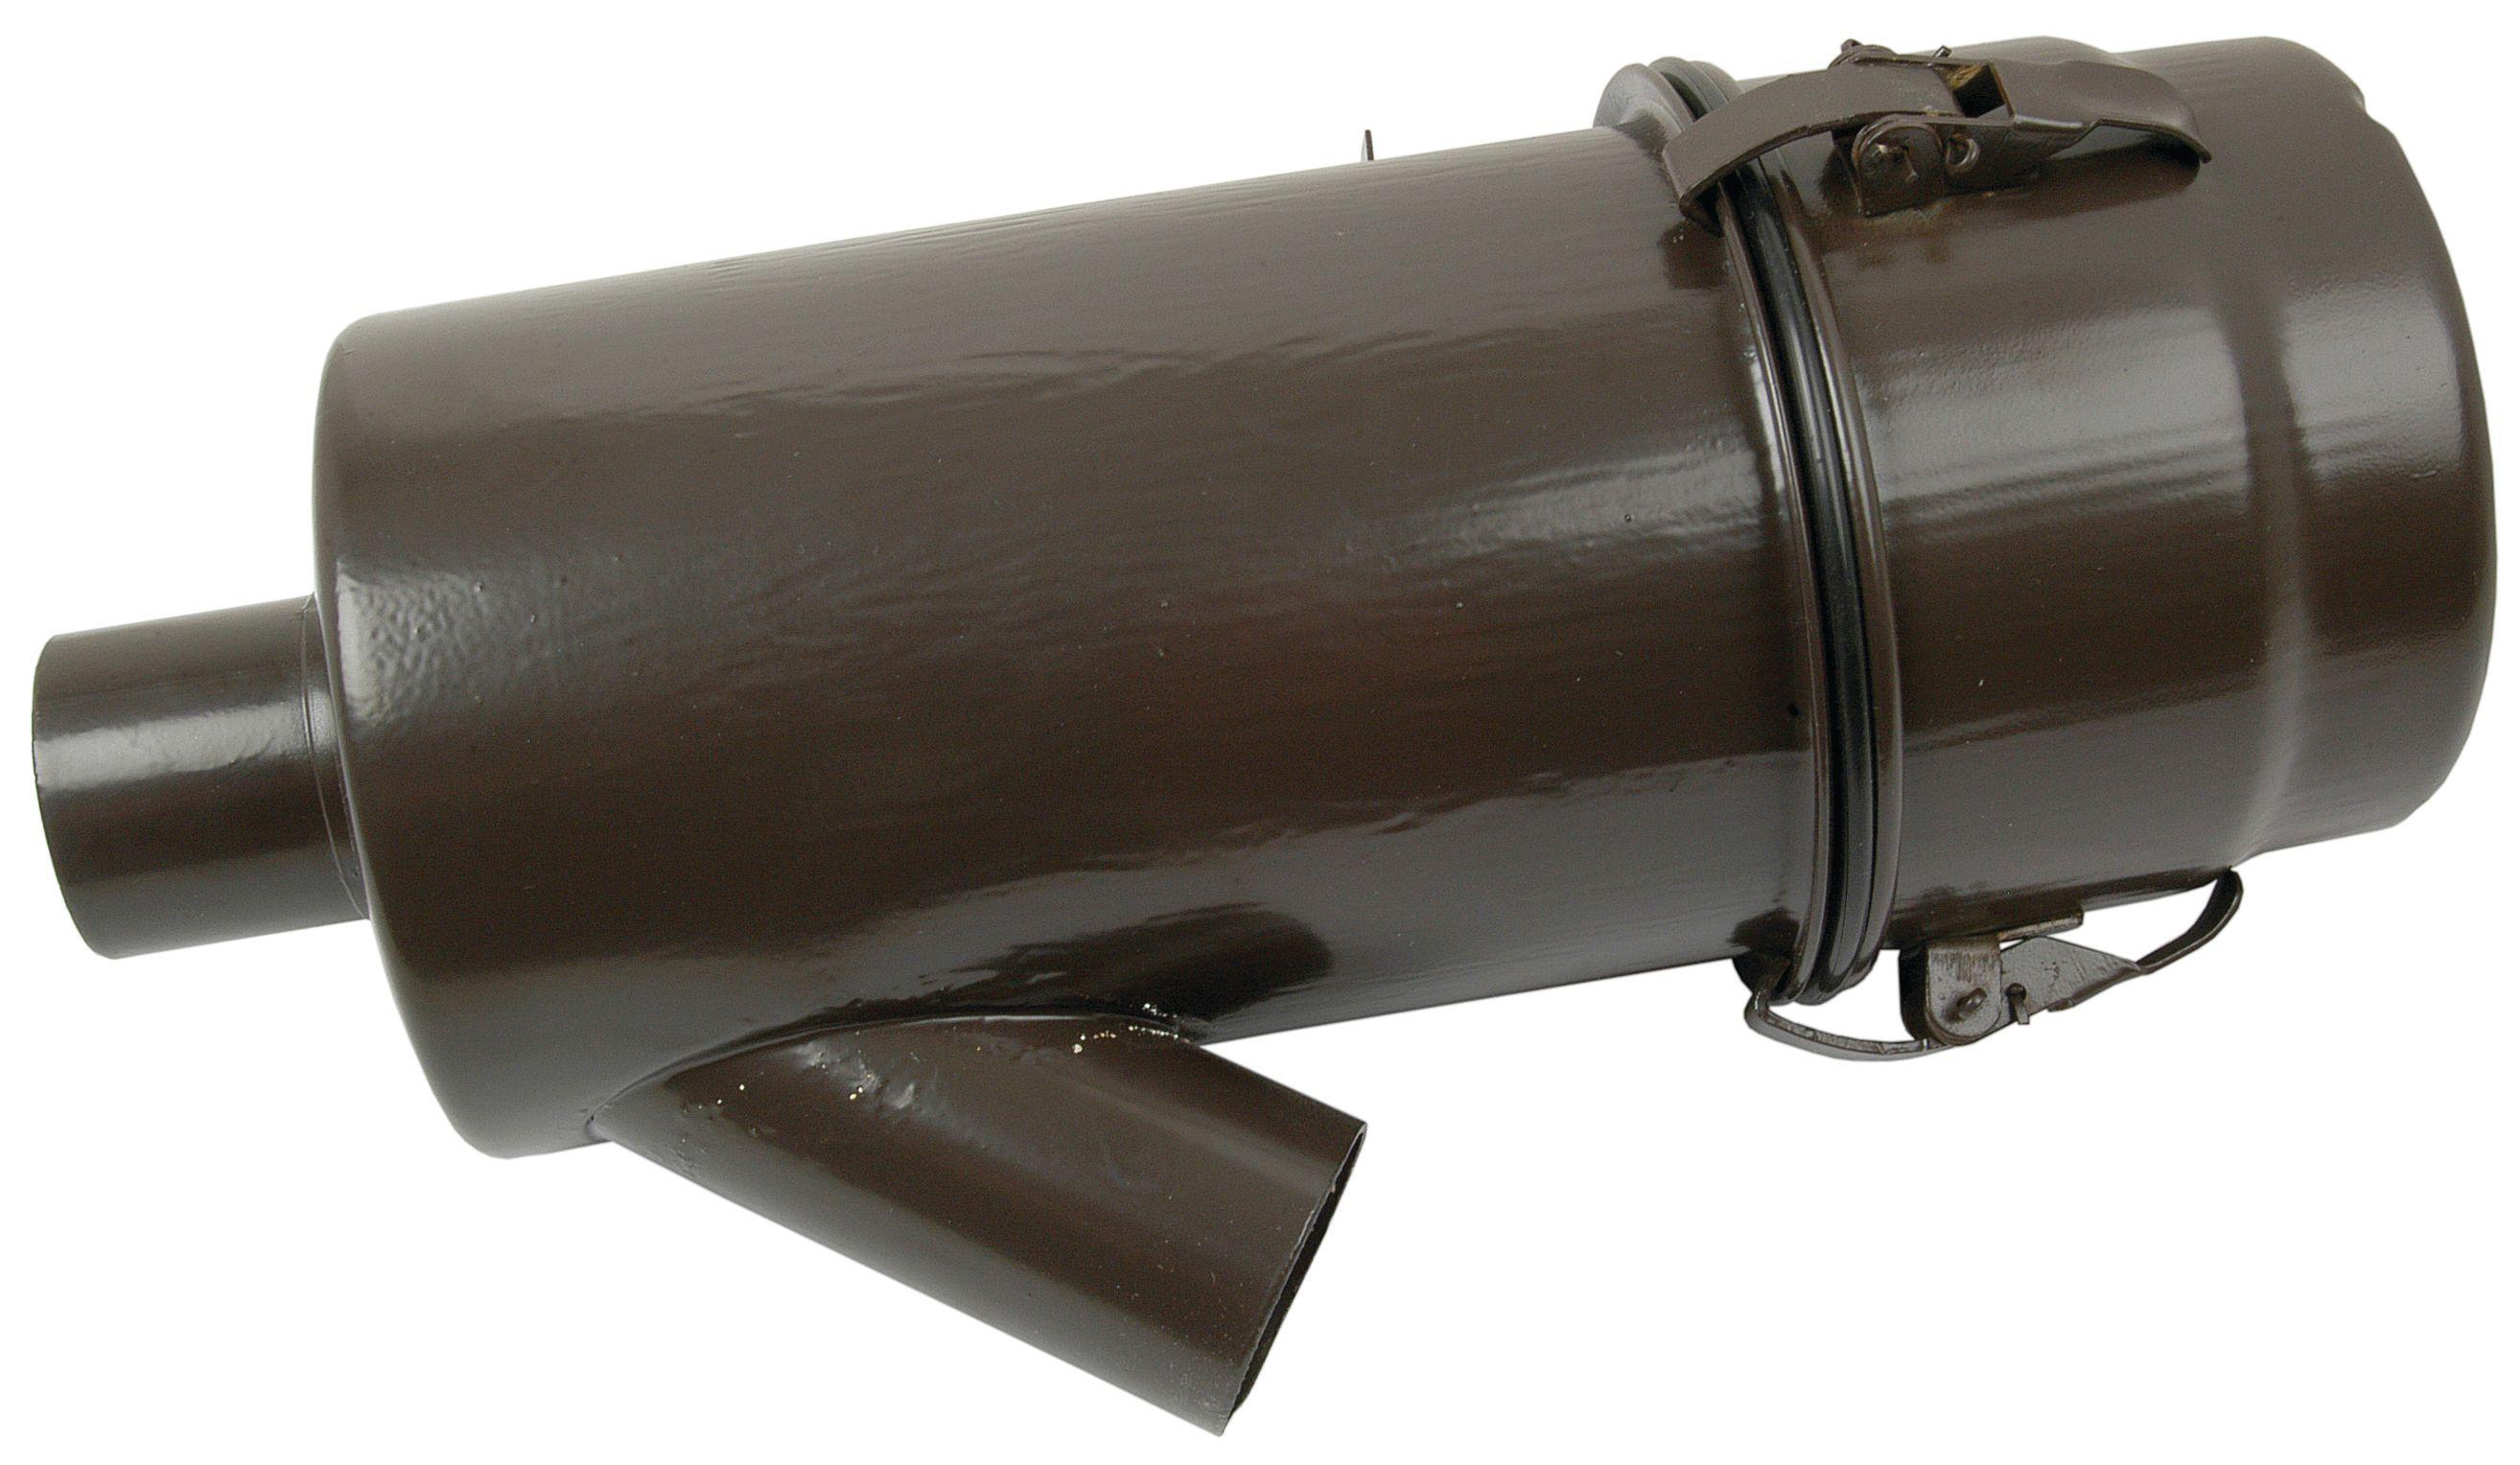 PERKINS OIL BATH CLEANER 40552